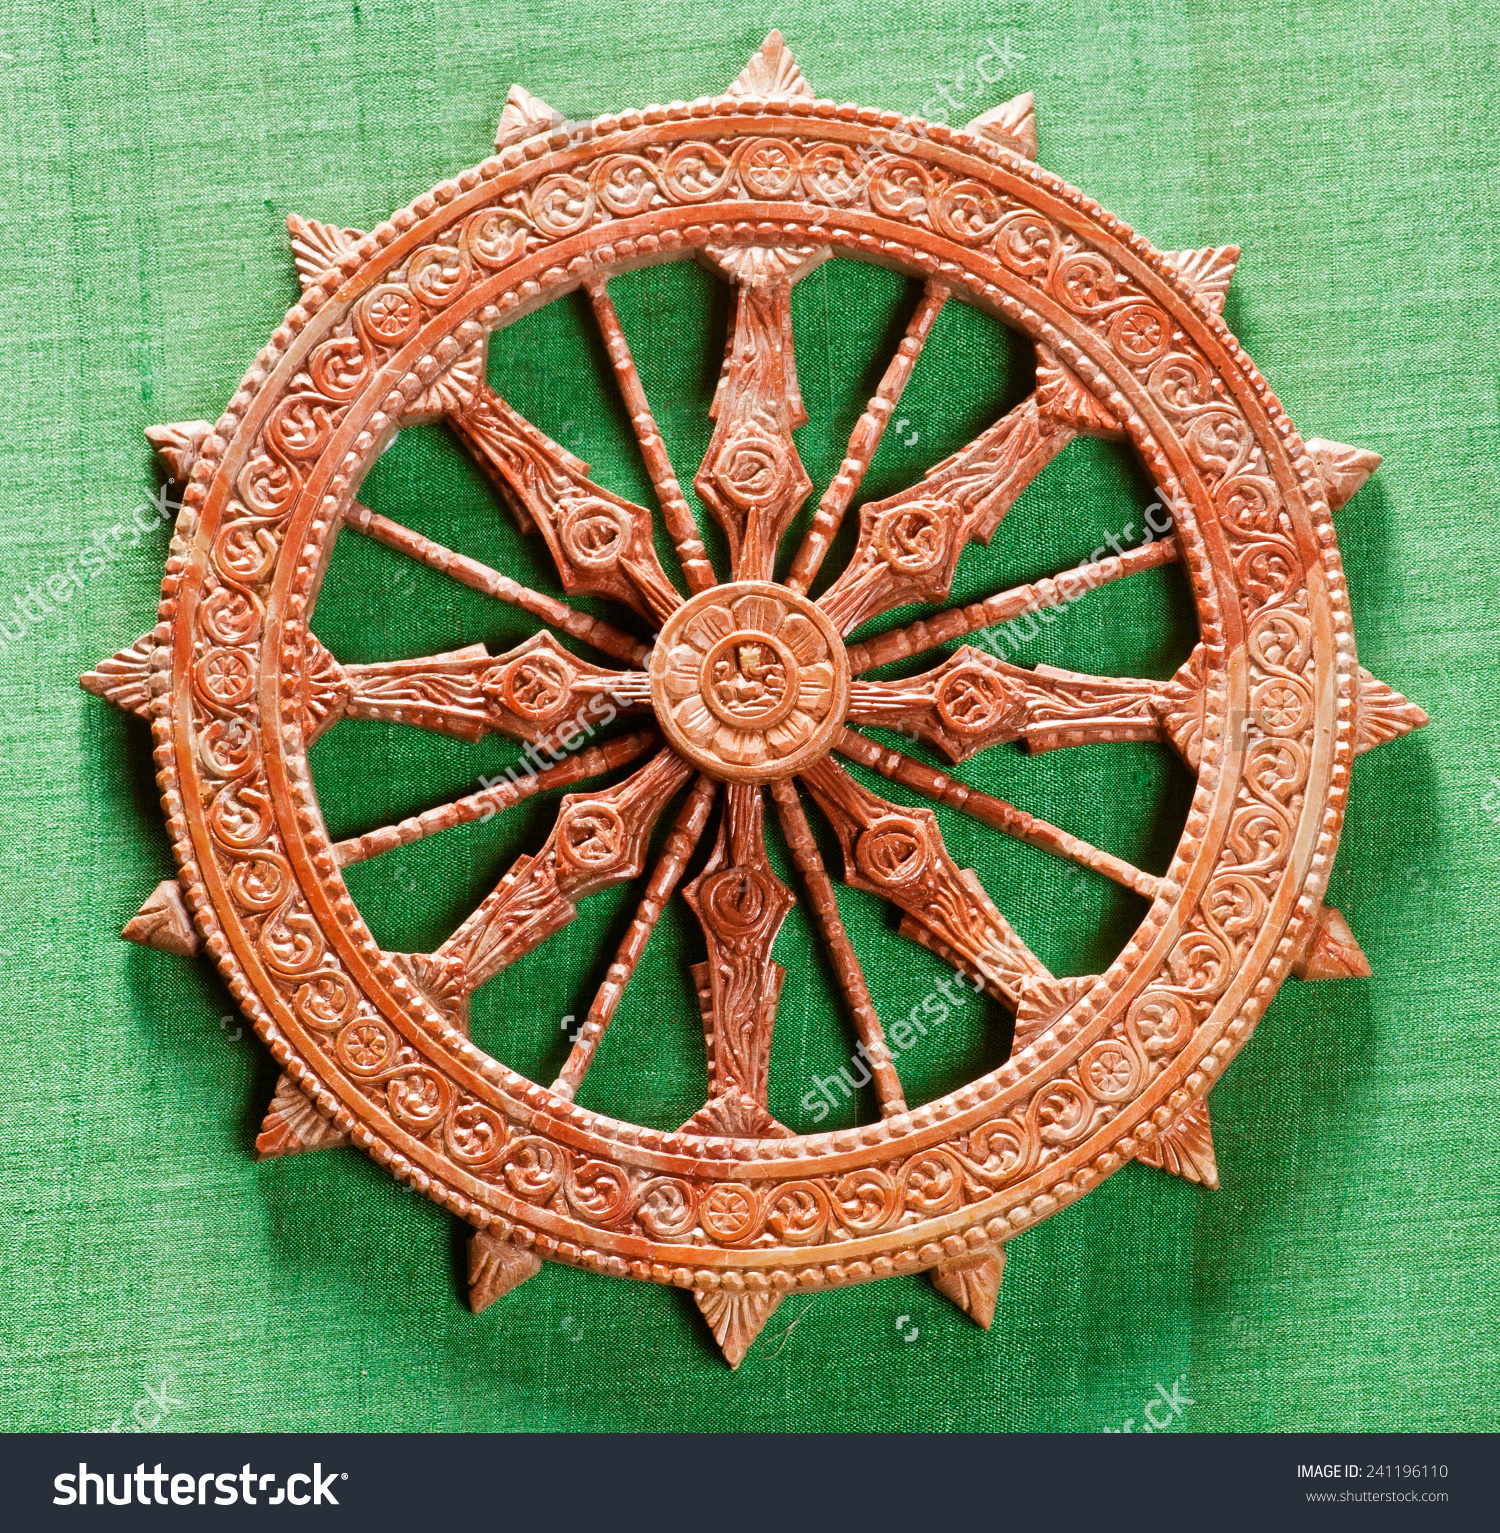 Miniature Replica Konark Sun Temple Wheel Stock Photo 241196110.